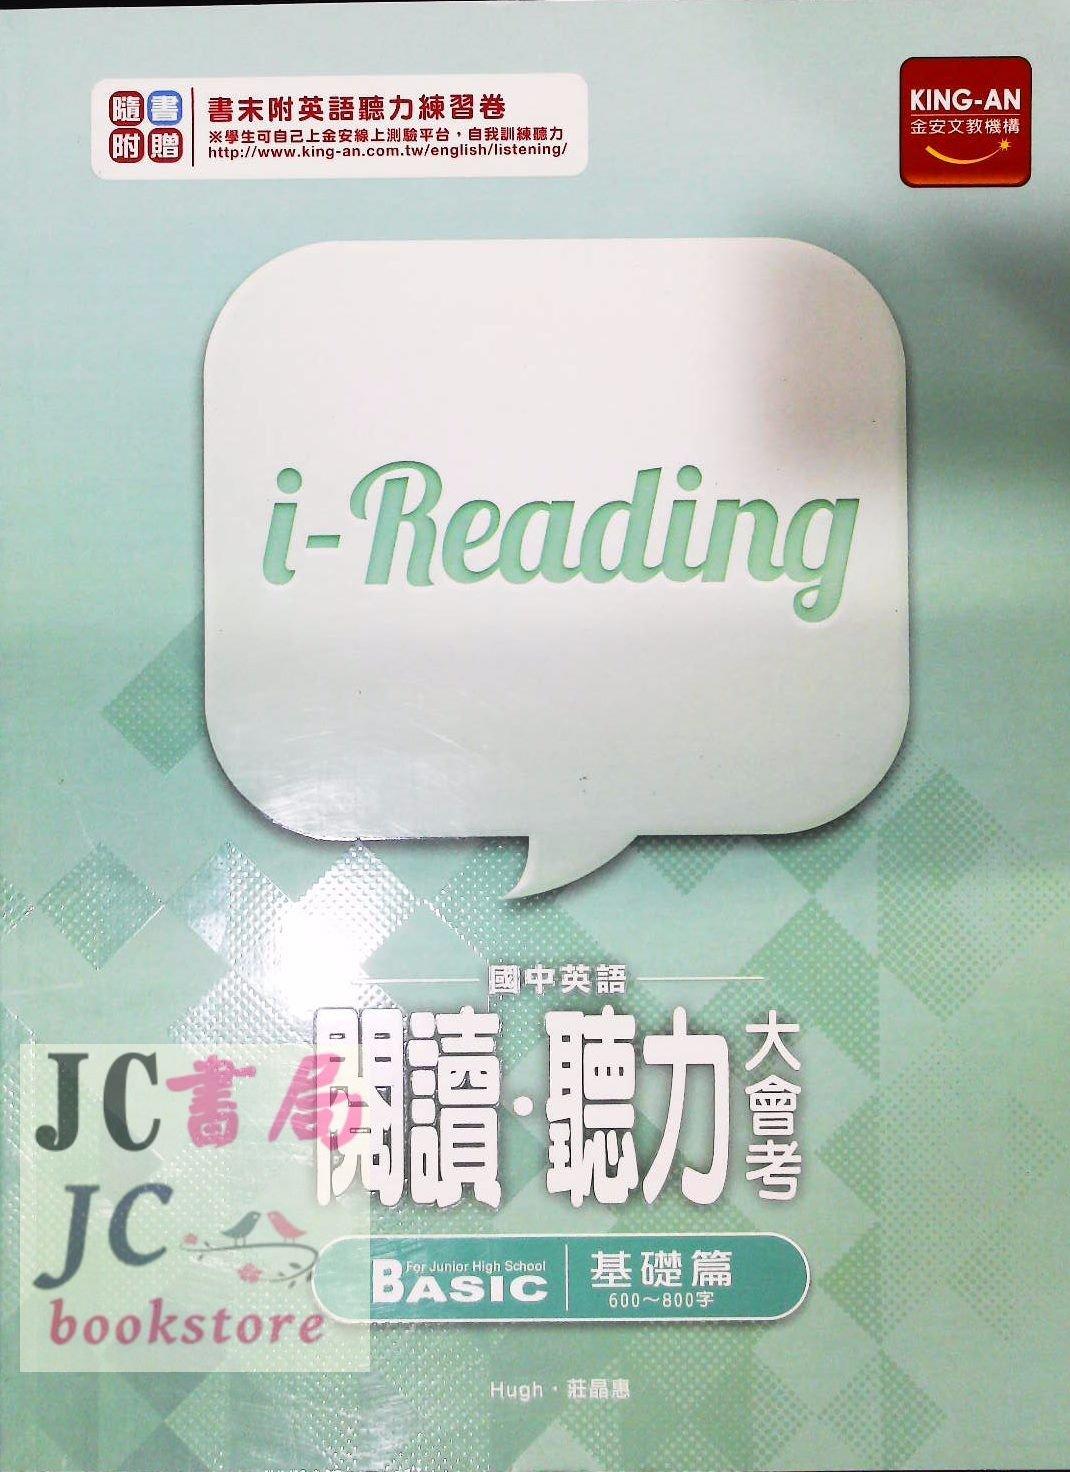 【JC書局】金安國中 閱讀 聽力大會考 英語 (基礎篇) 聽力需線上聽 P2有網址